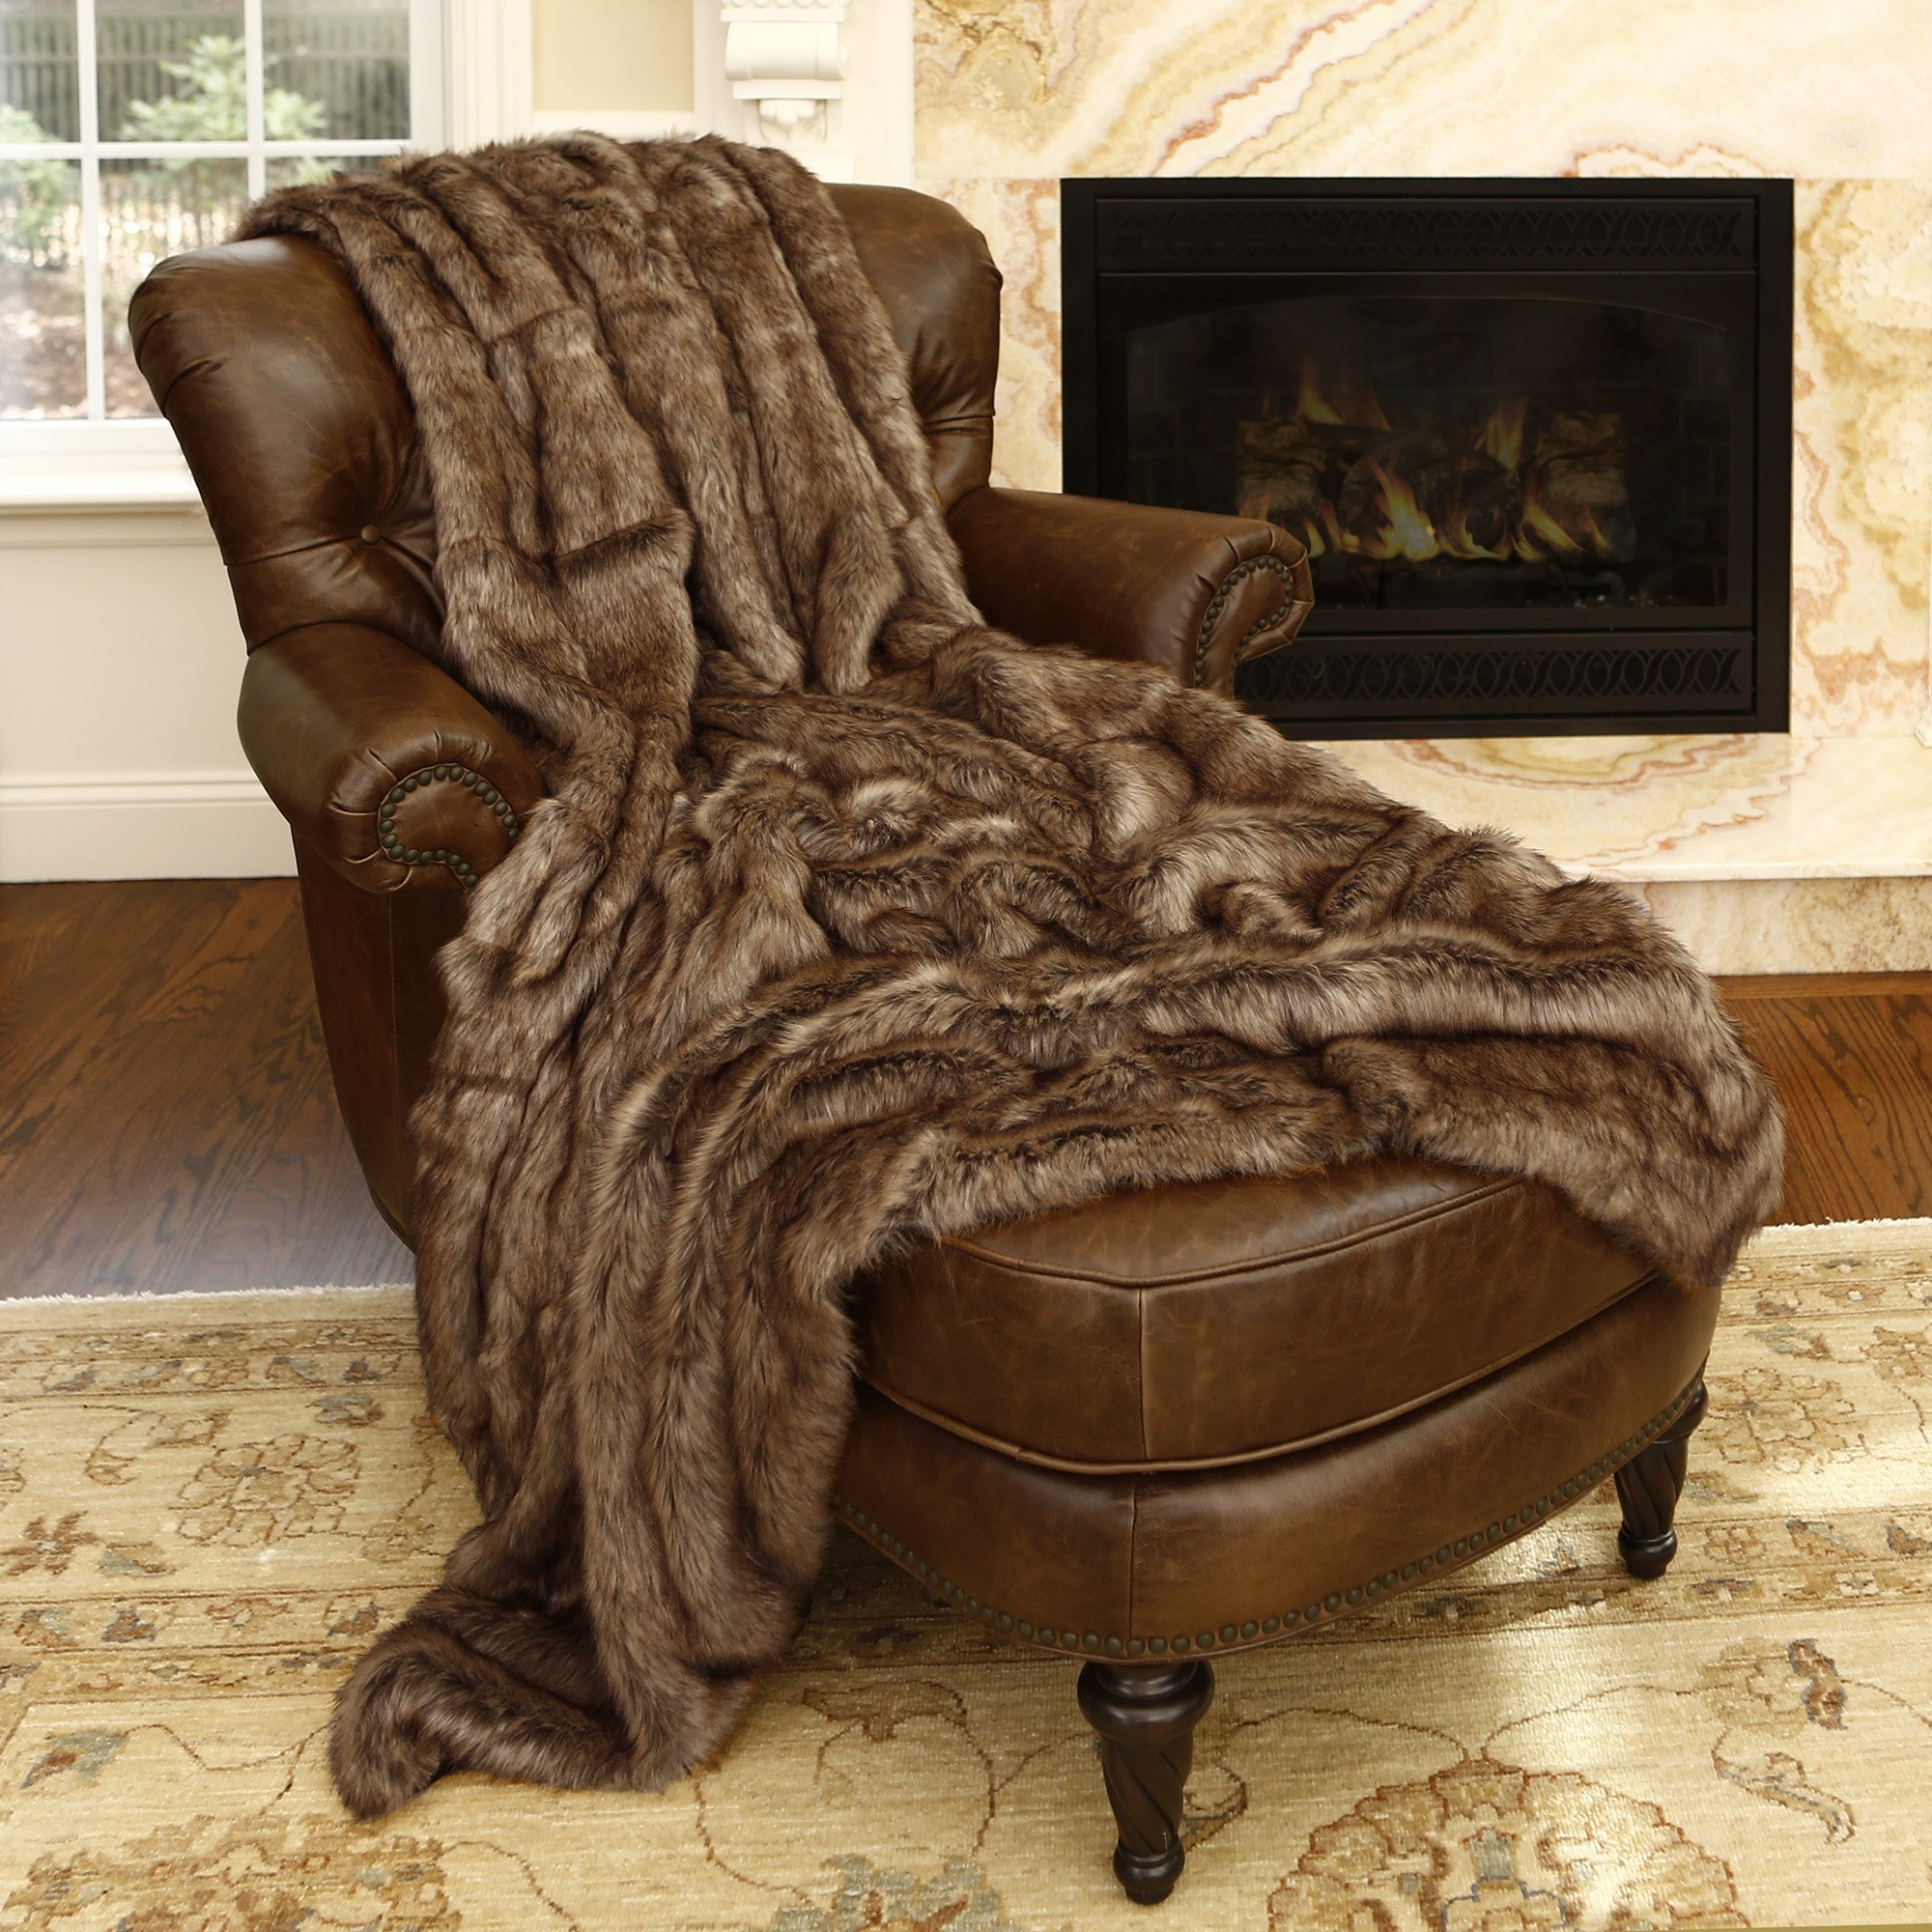 Best Home Fashion Faux Fur Throw - Full Blanket - Coyote - 58''W x 84''L - (1 Throw)